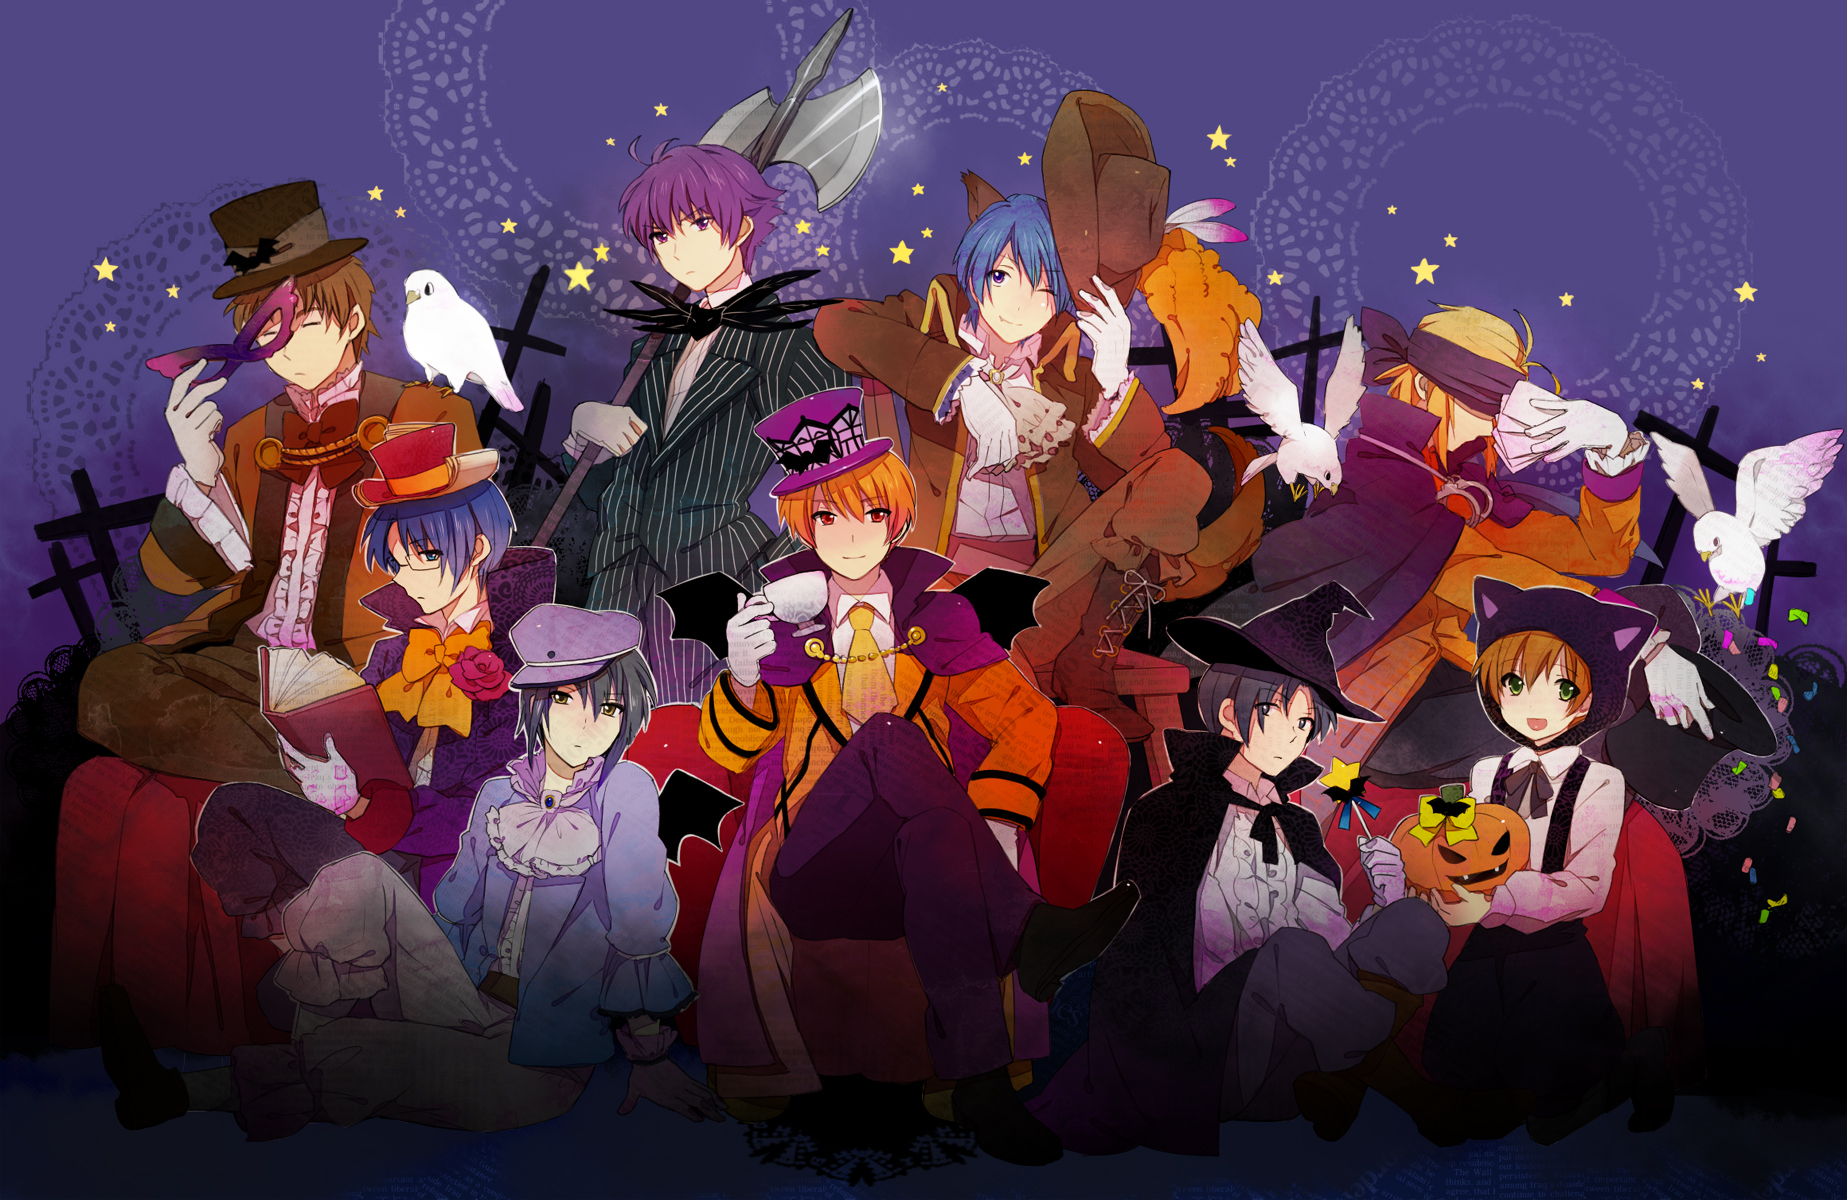 all_male angel_beats! animal animal_ears bird cape fujimaki halloween hat hinata_hideki male mask matsushita naoi_ayato noda ooyama otonashi_yuzuru takamatsu tk tomako weapon